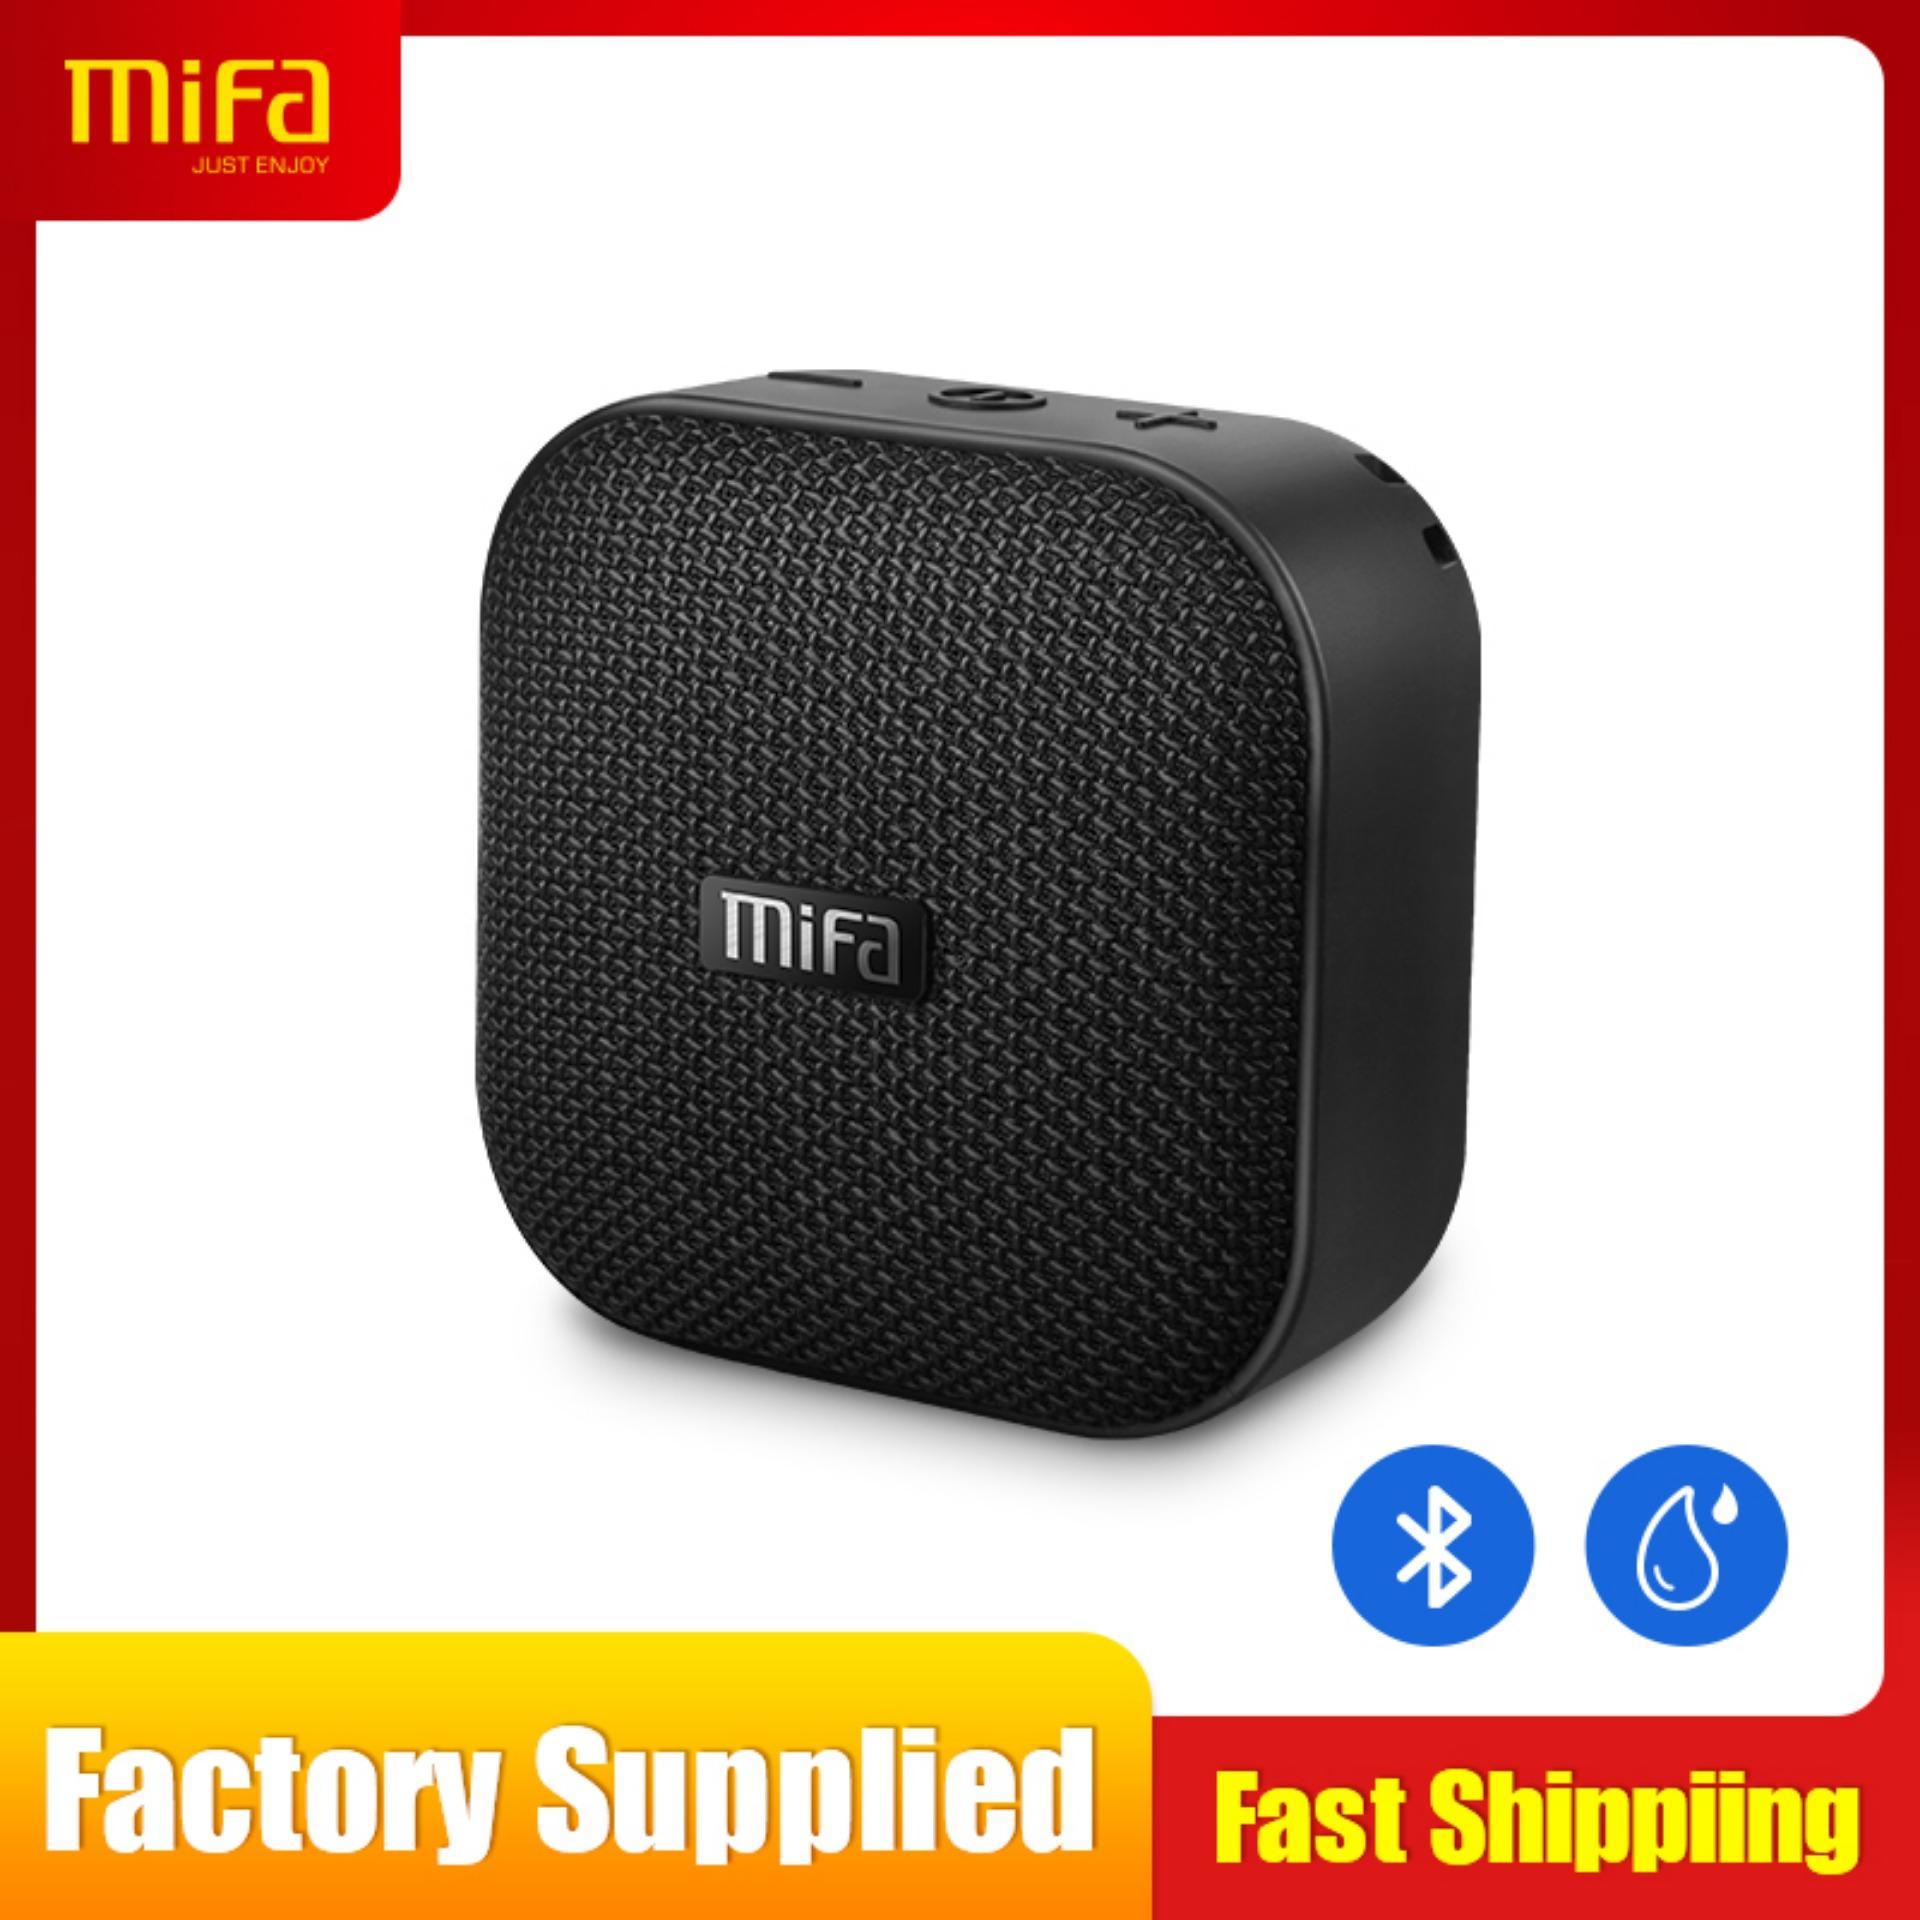 [24 MONTH WARRANTY]MIFA Bluetooth Speaker, Portable True Wireless Speaker  with HD Sound & Bold Bass, IP56 Dustproof & Waterproof, 12-Hour Playtime,